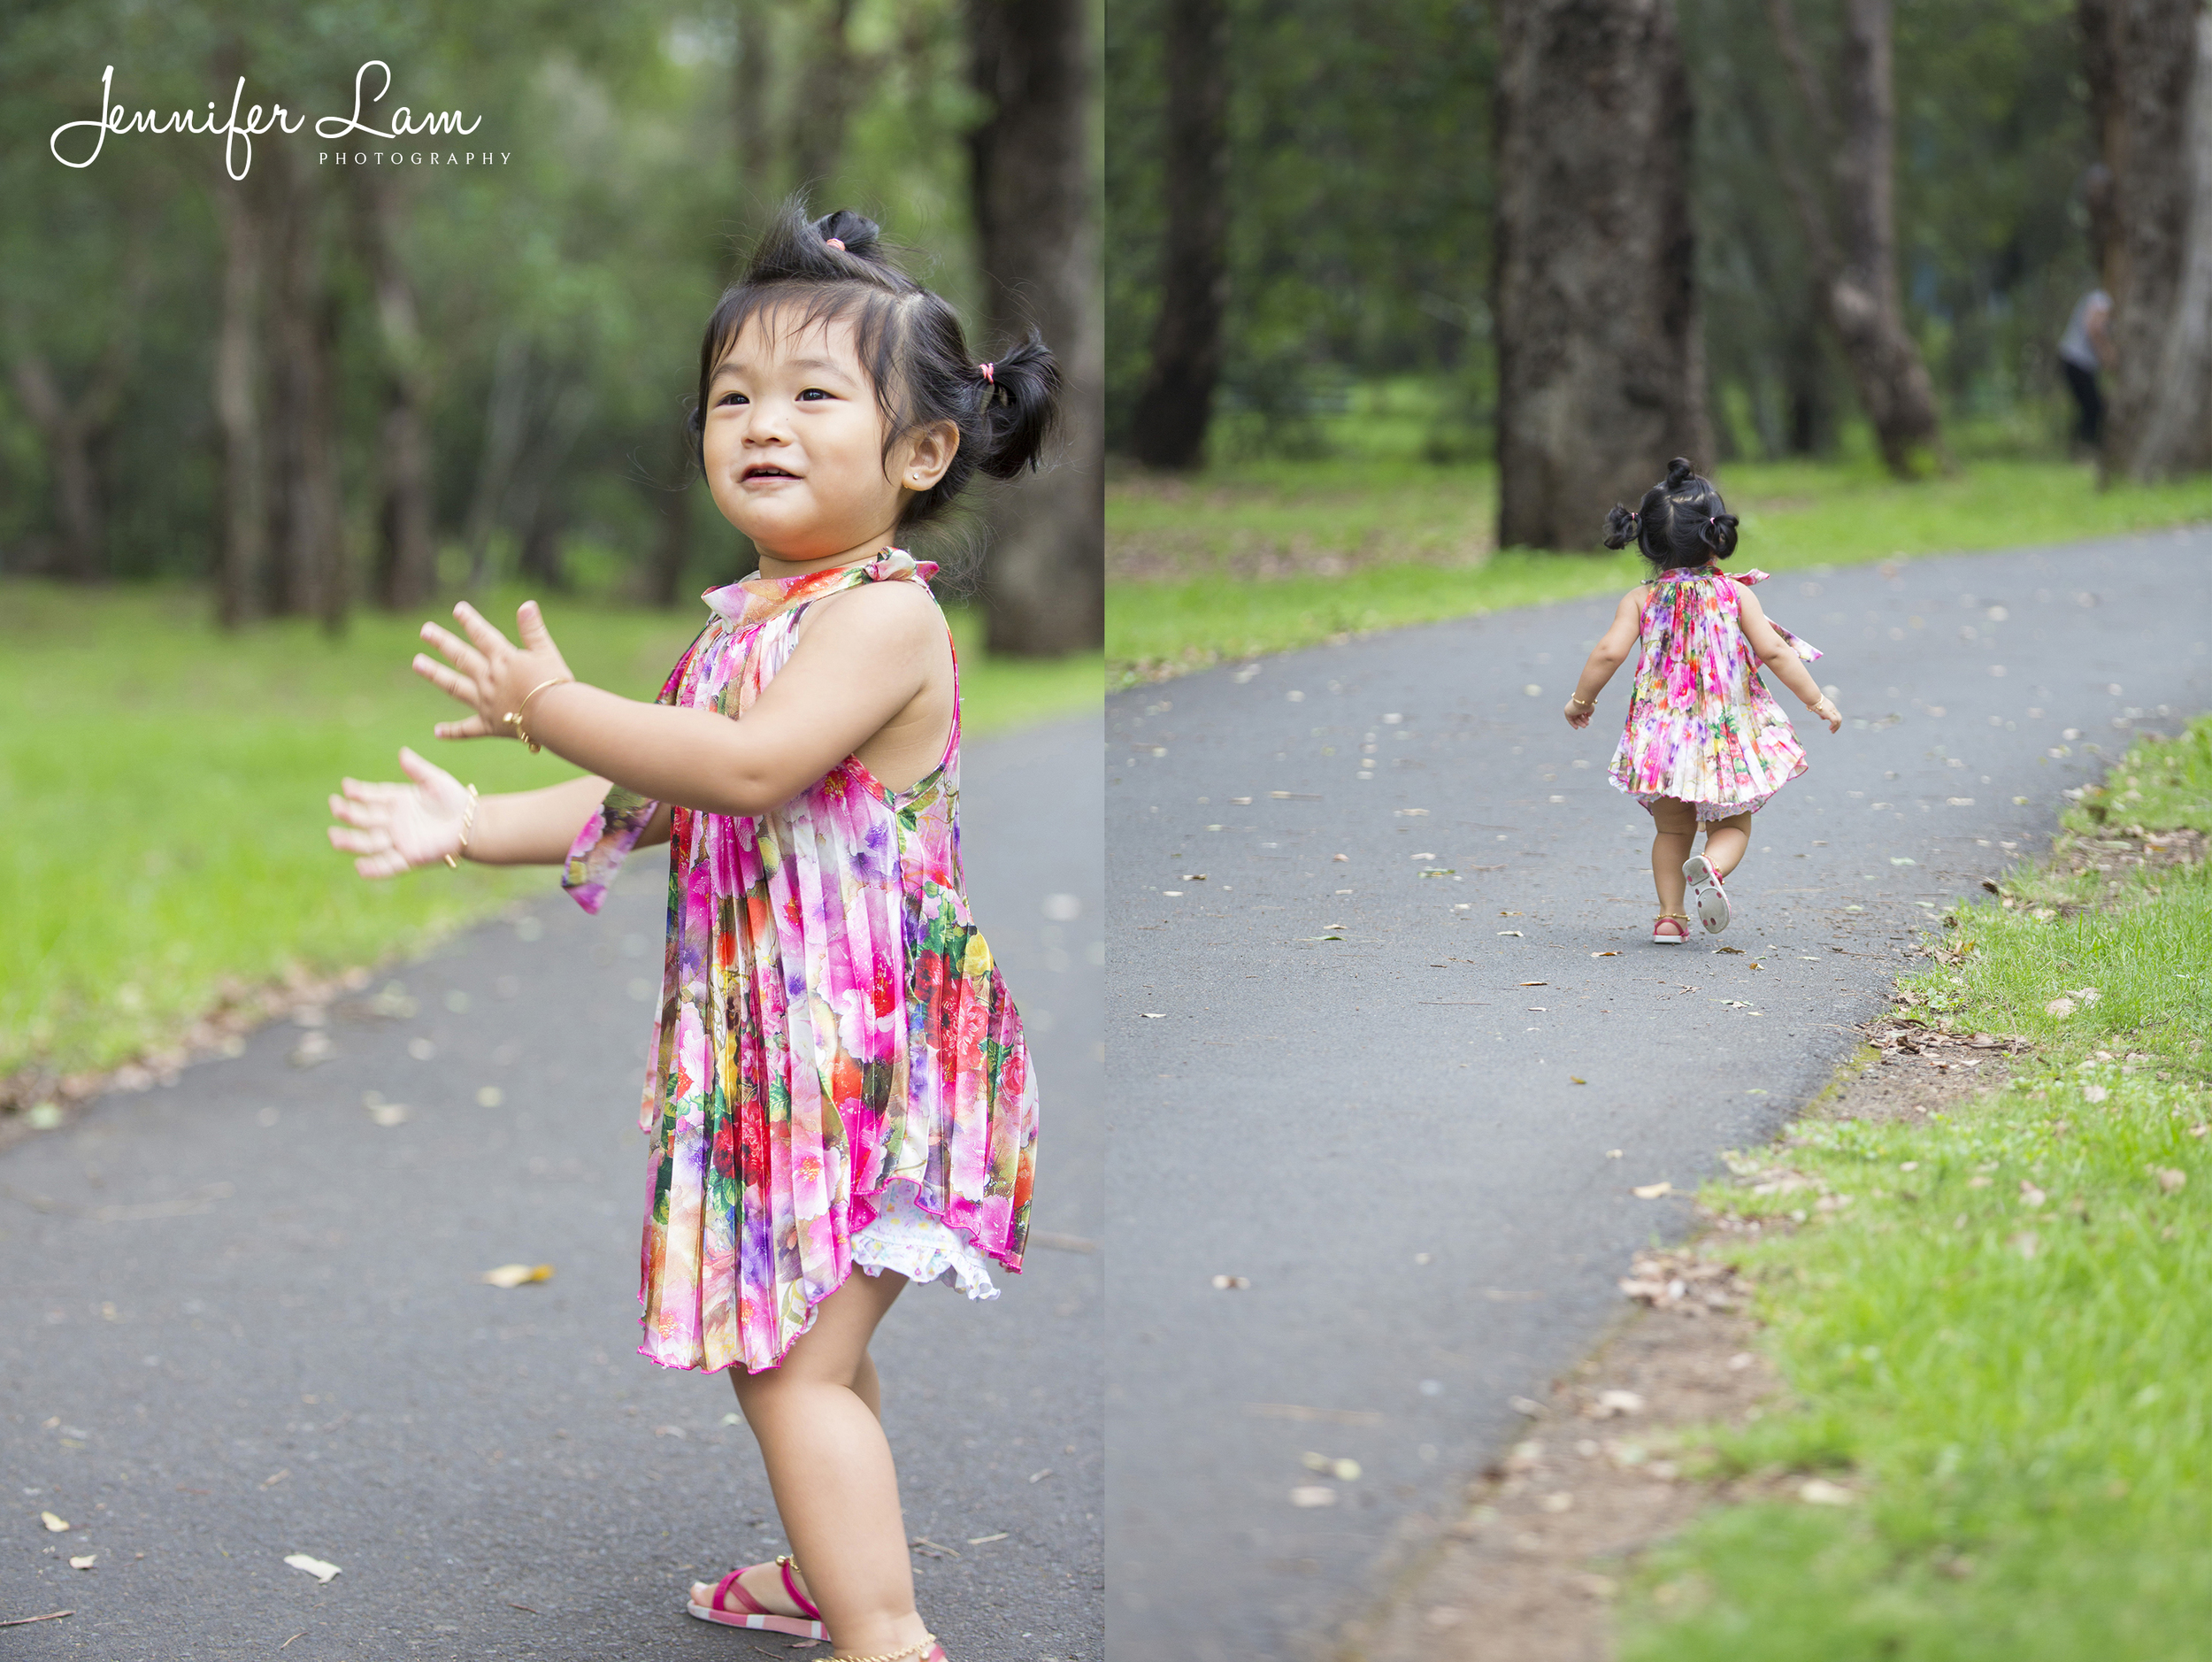 Family Portrait Session - Sydney - Jennifer Lam Photography (24).jpg